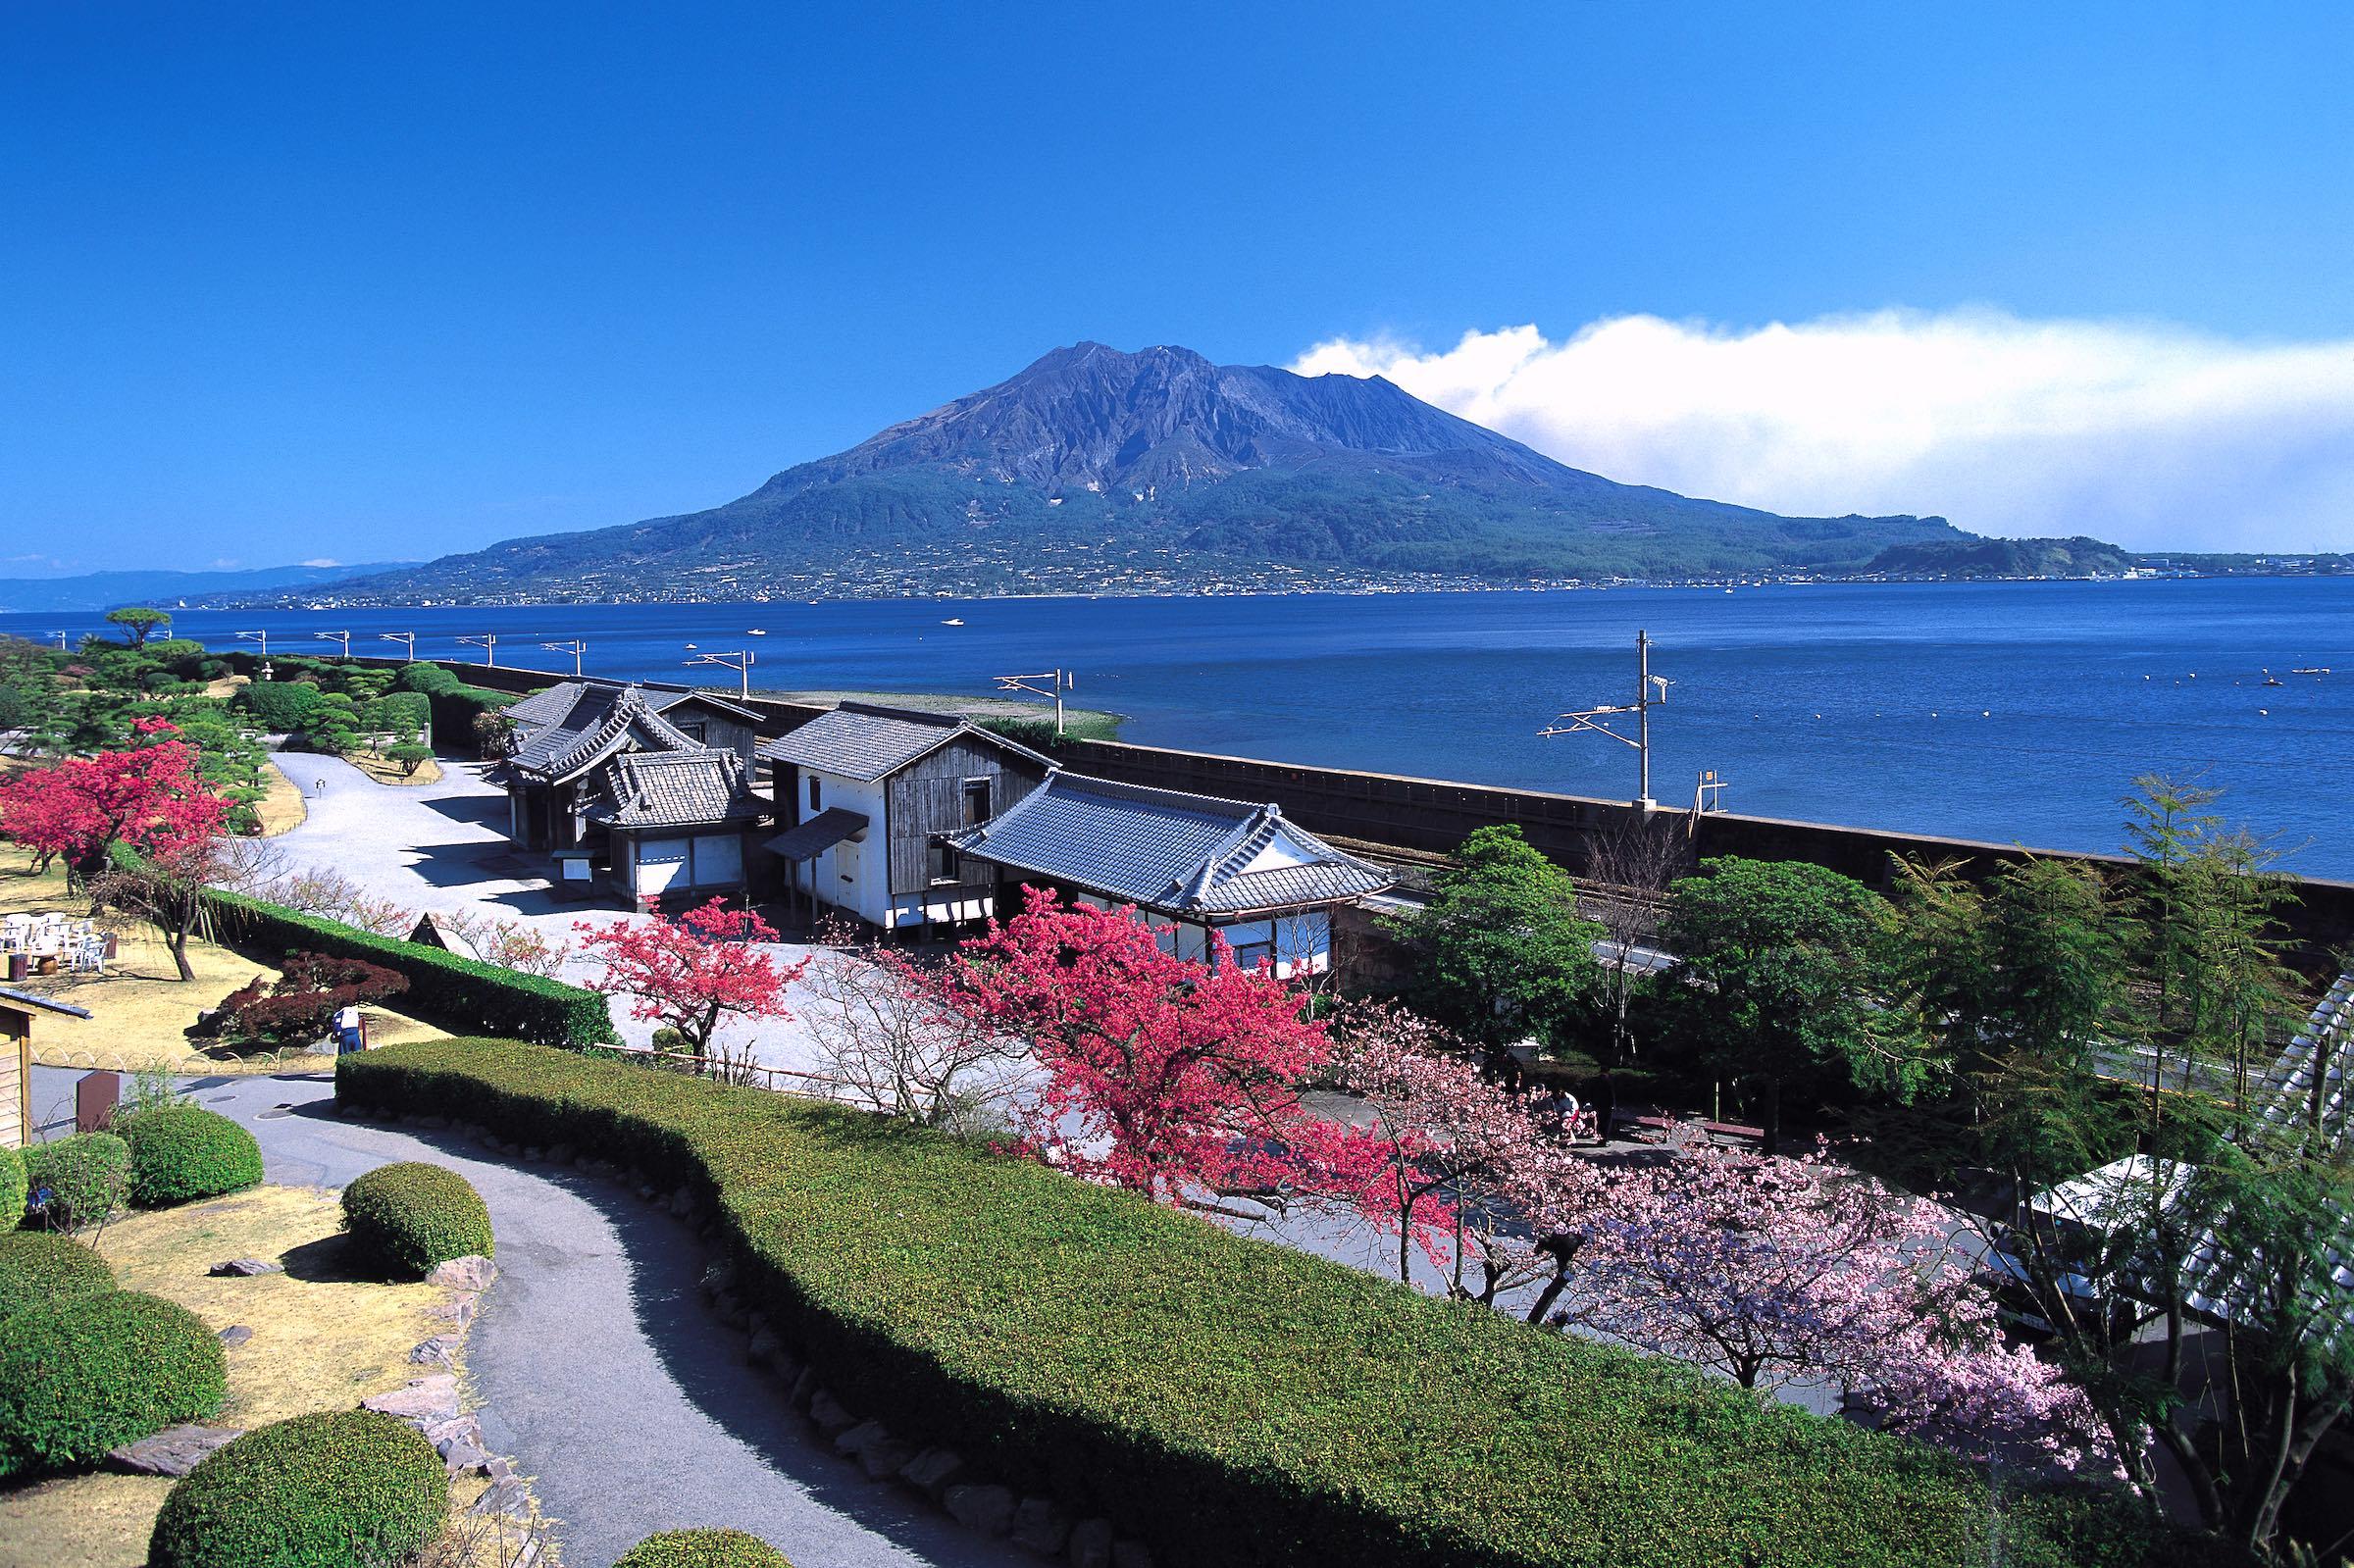 Image result for Senganen sakurajima japan